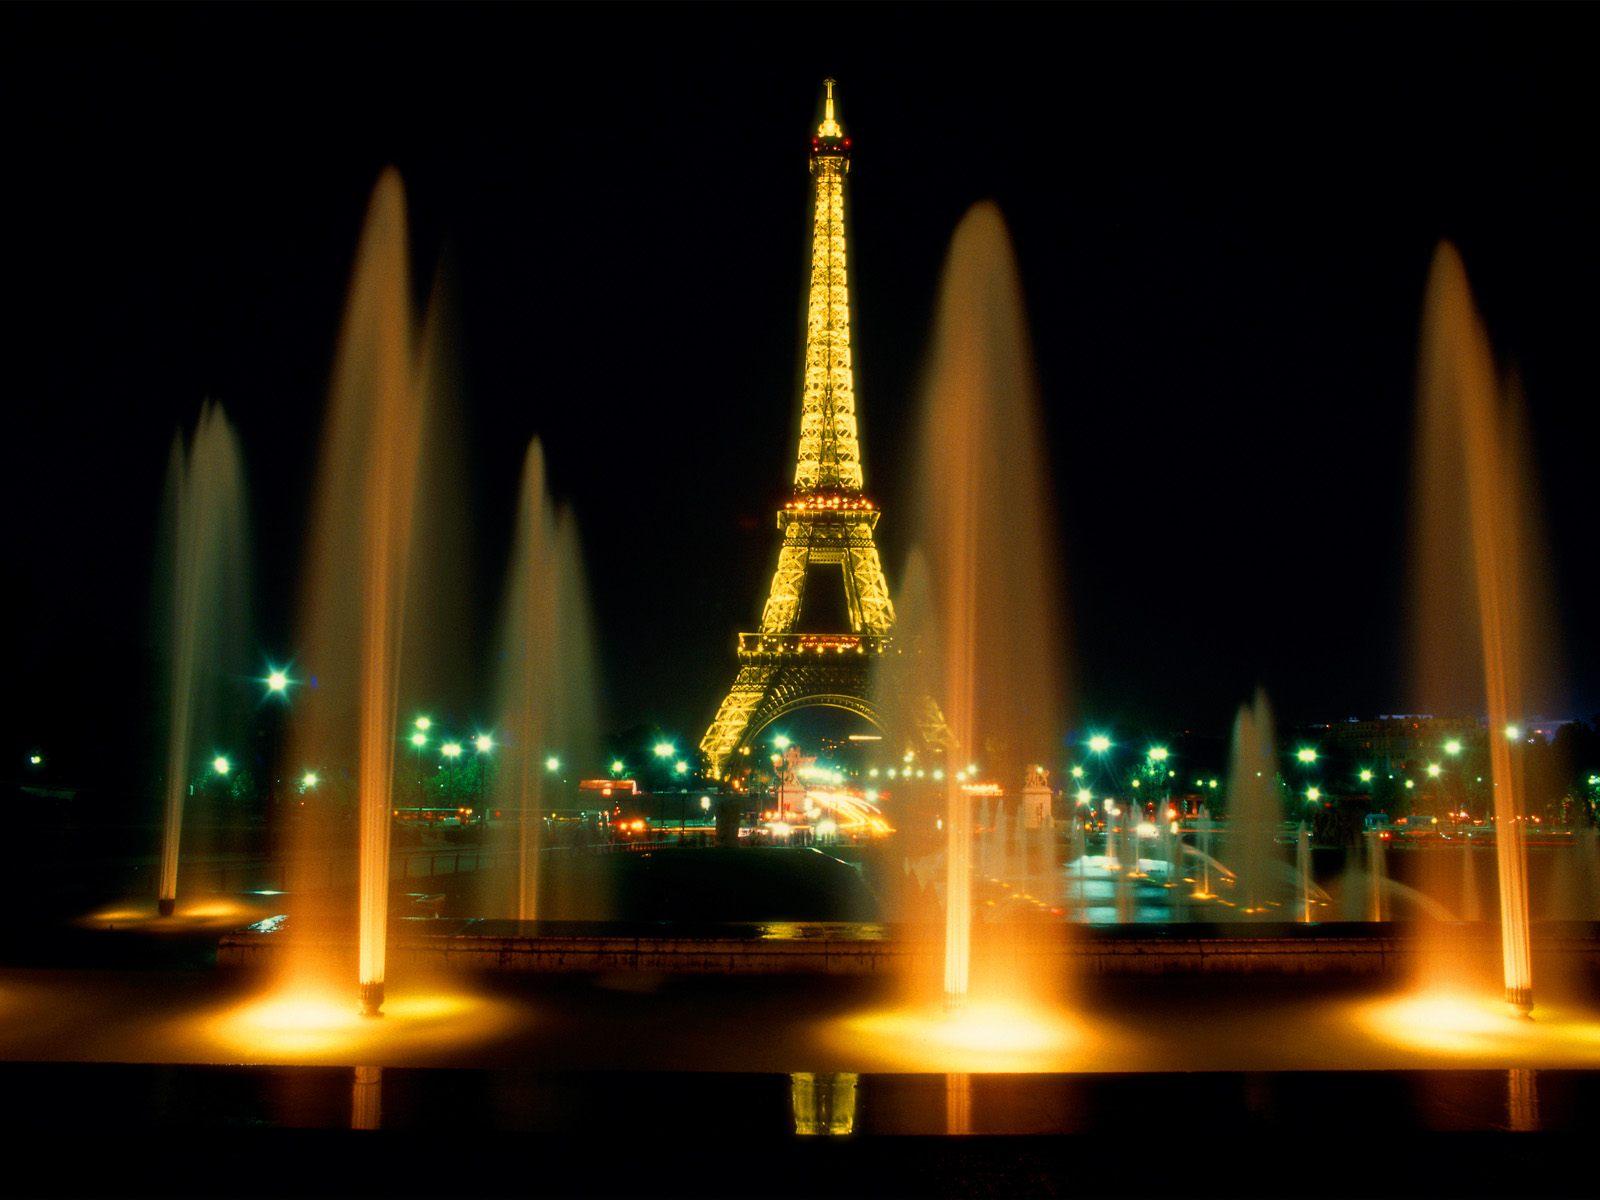 http://2.bp.blogspot.com/_JvtQbU1sF94/TNQVopEEUbI/AAAAAAAAAVg/GyO6mnrdEjY/s1600/eiffel_tower_night.jpg